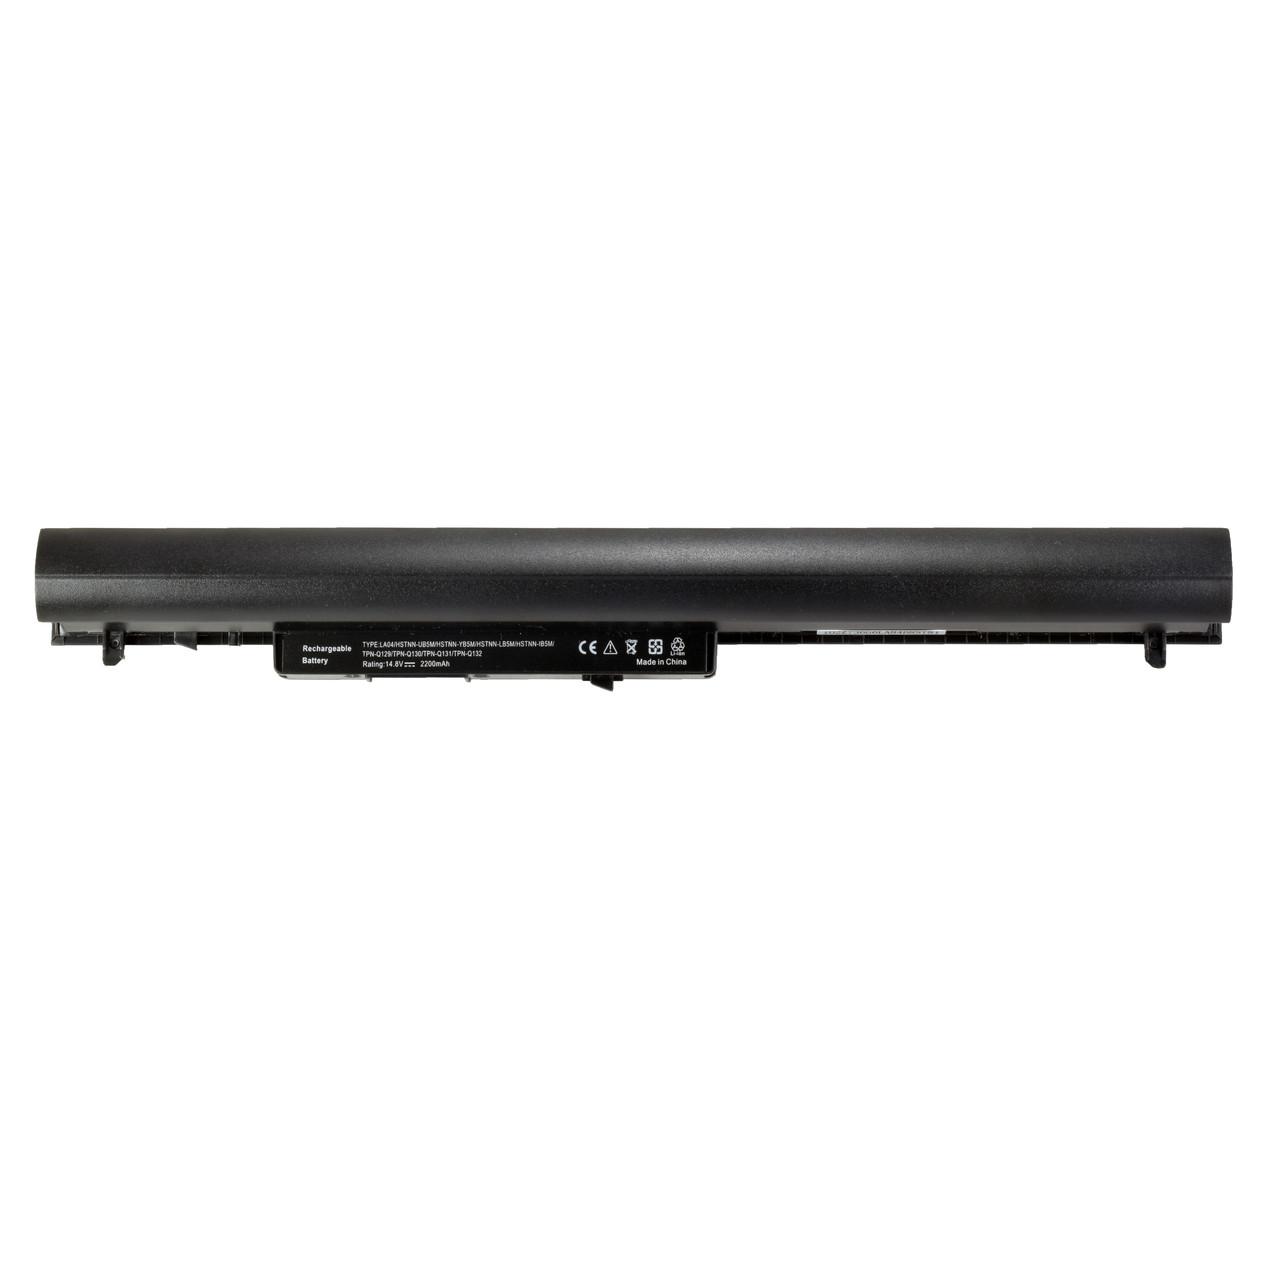 Батарея для ноутбука HP Pavilion 14-n276TX(G4X40PA) 14-n272TX(G4X36PA) 14-n273TX(G4X37PA)14-n029tx(F2C40PA)